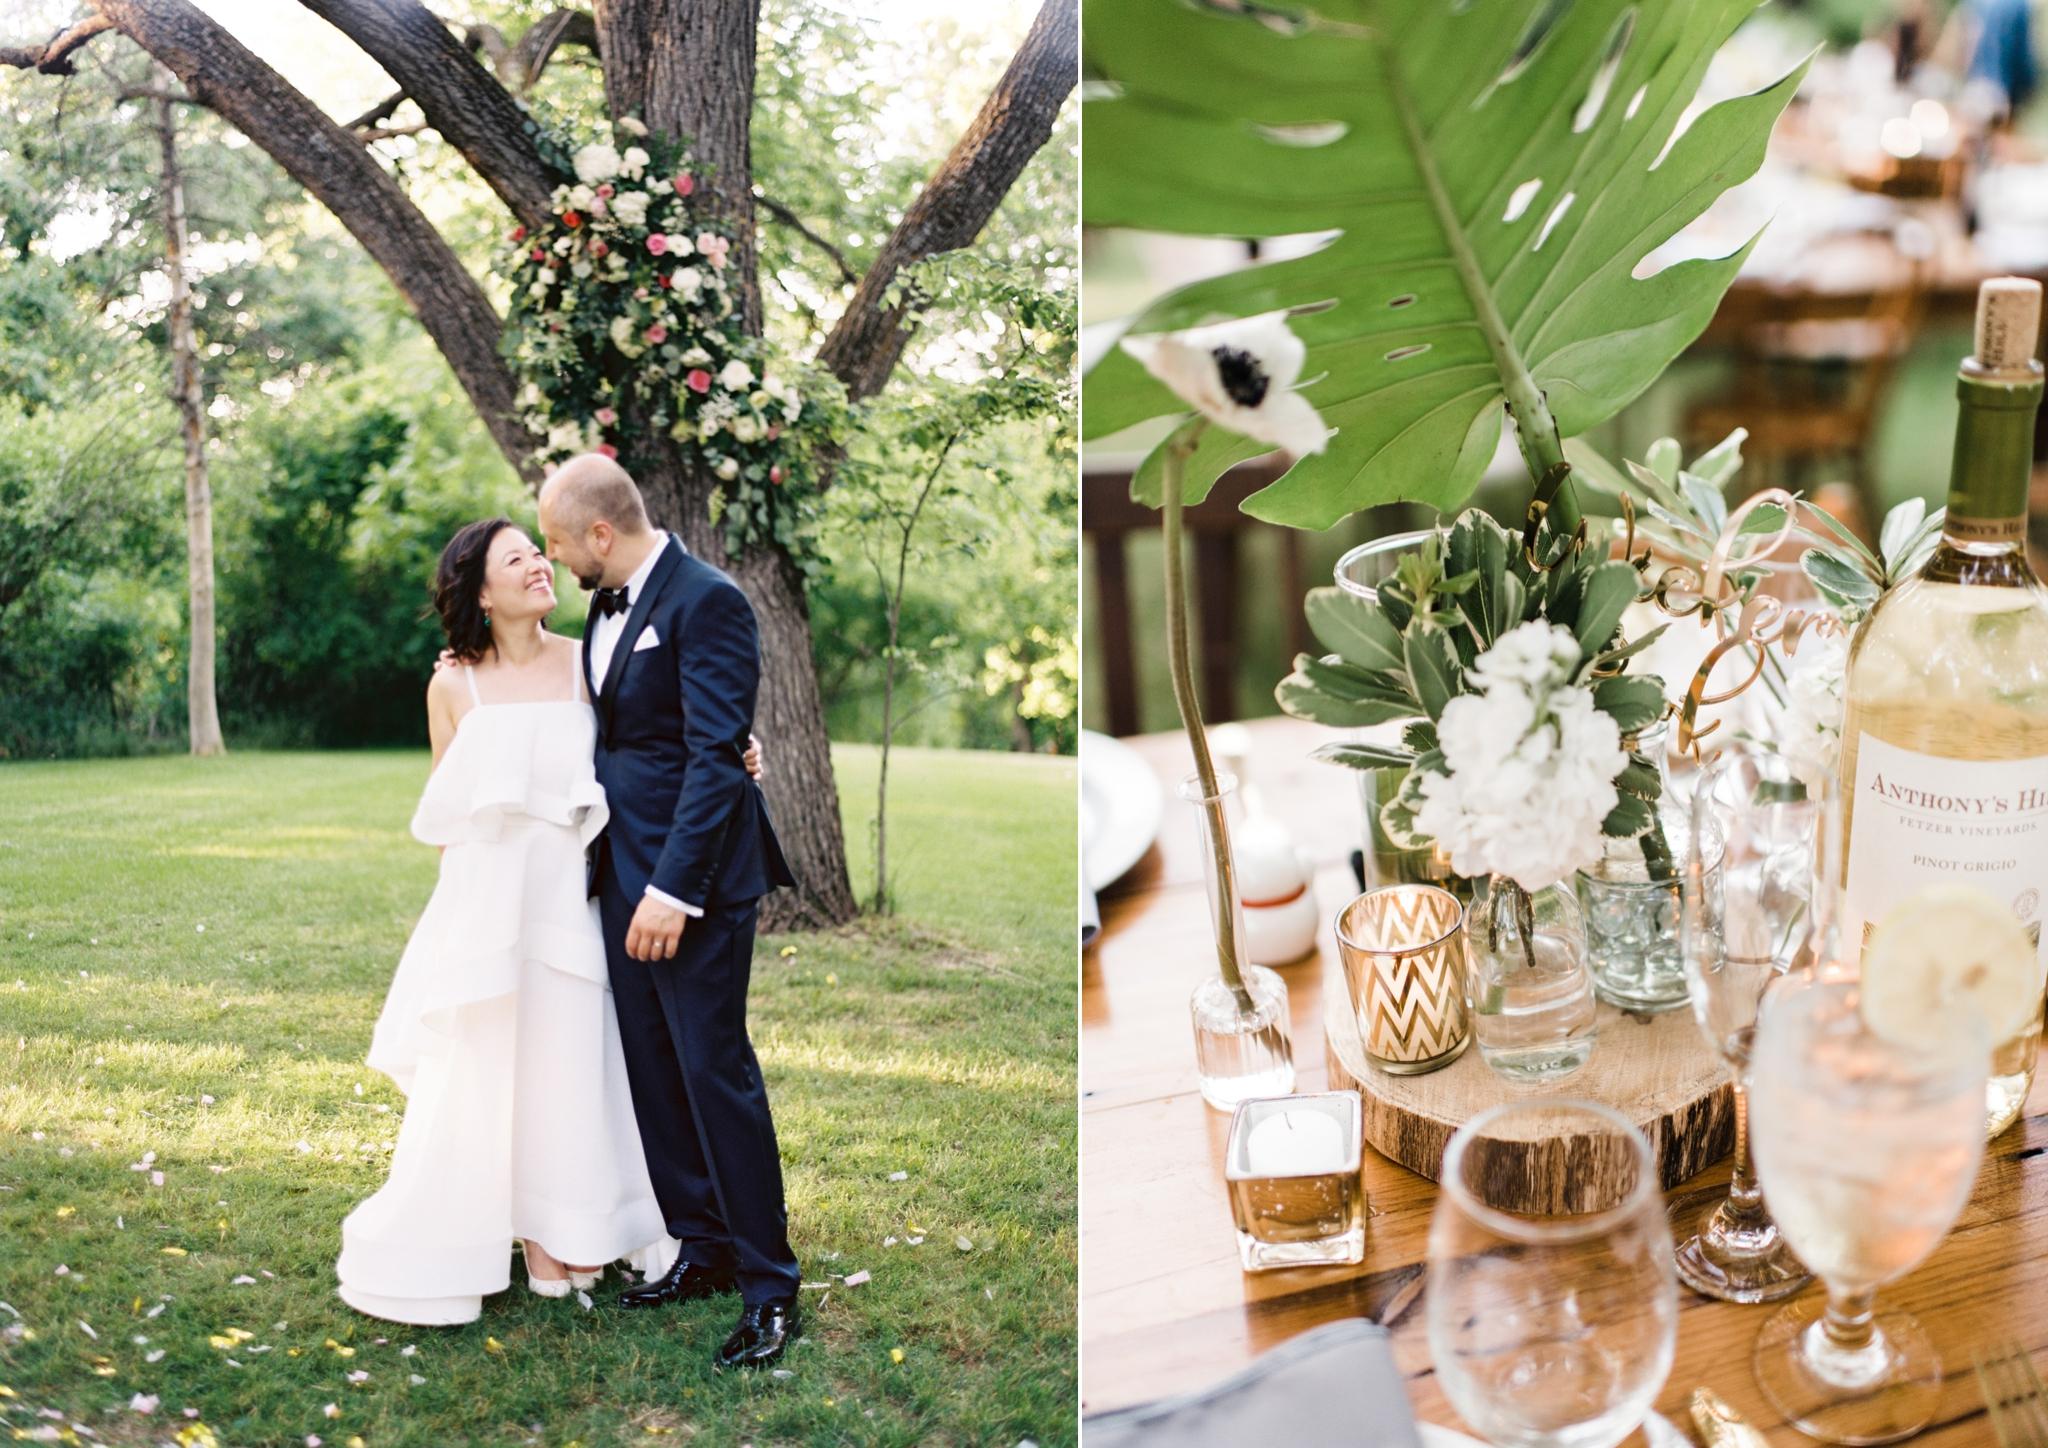 Illinois_backyard_wedding_0022.jpg